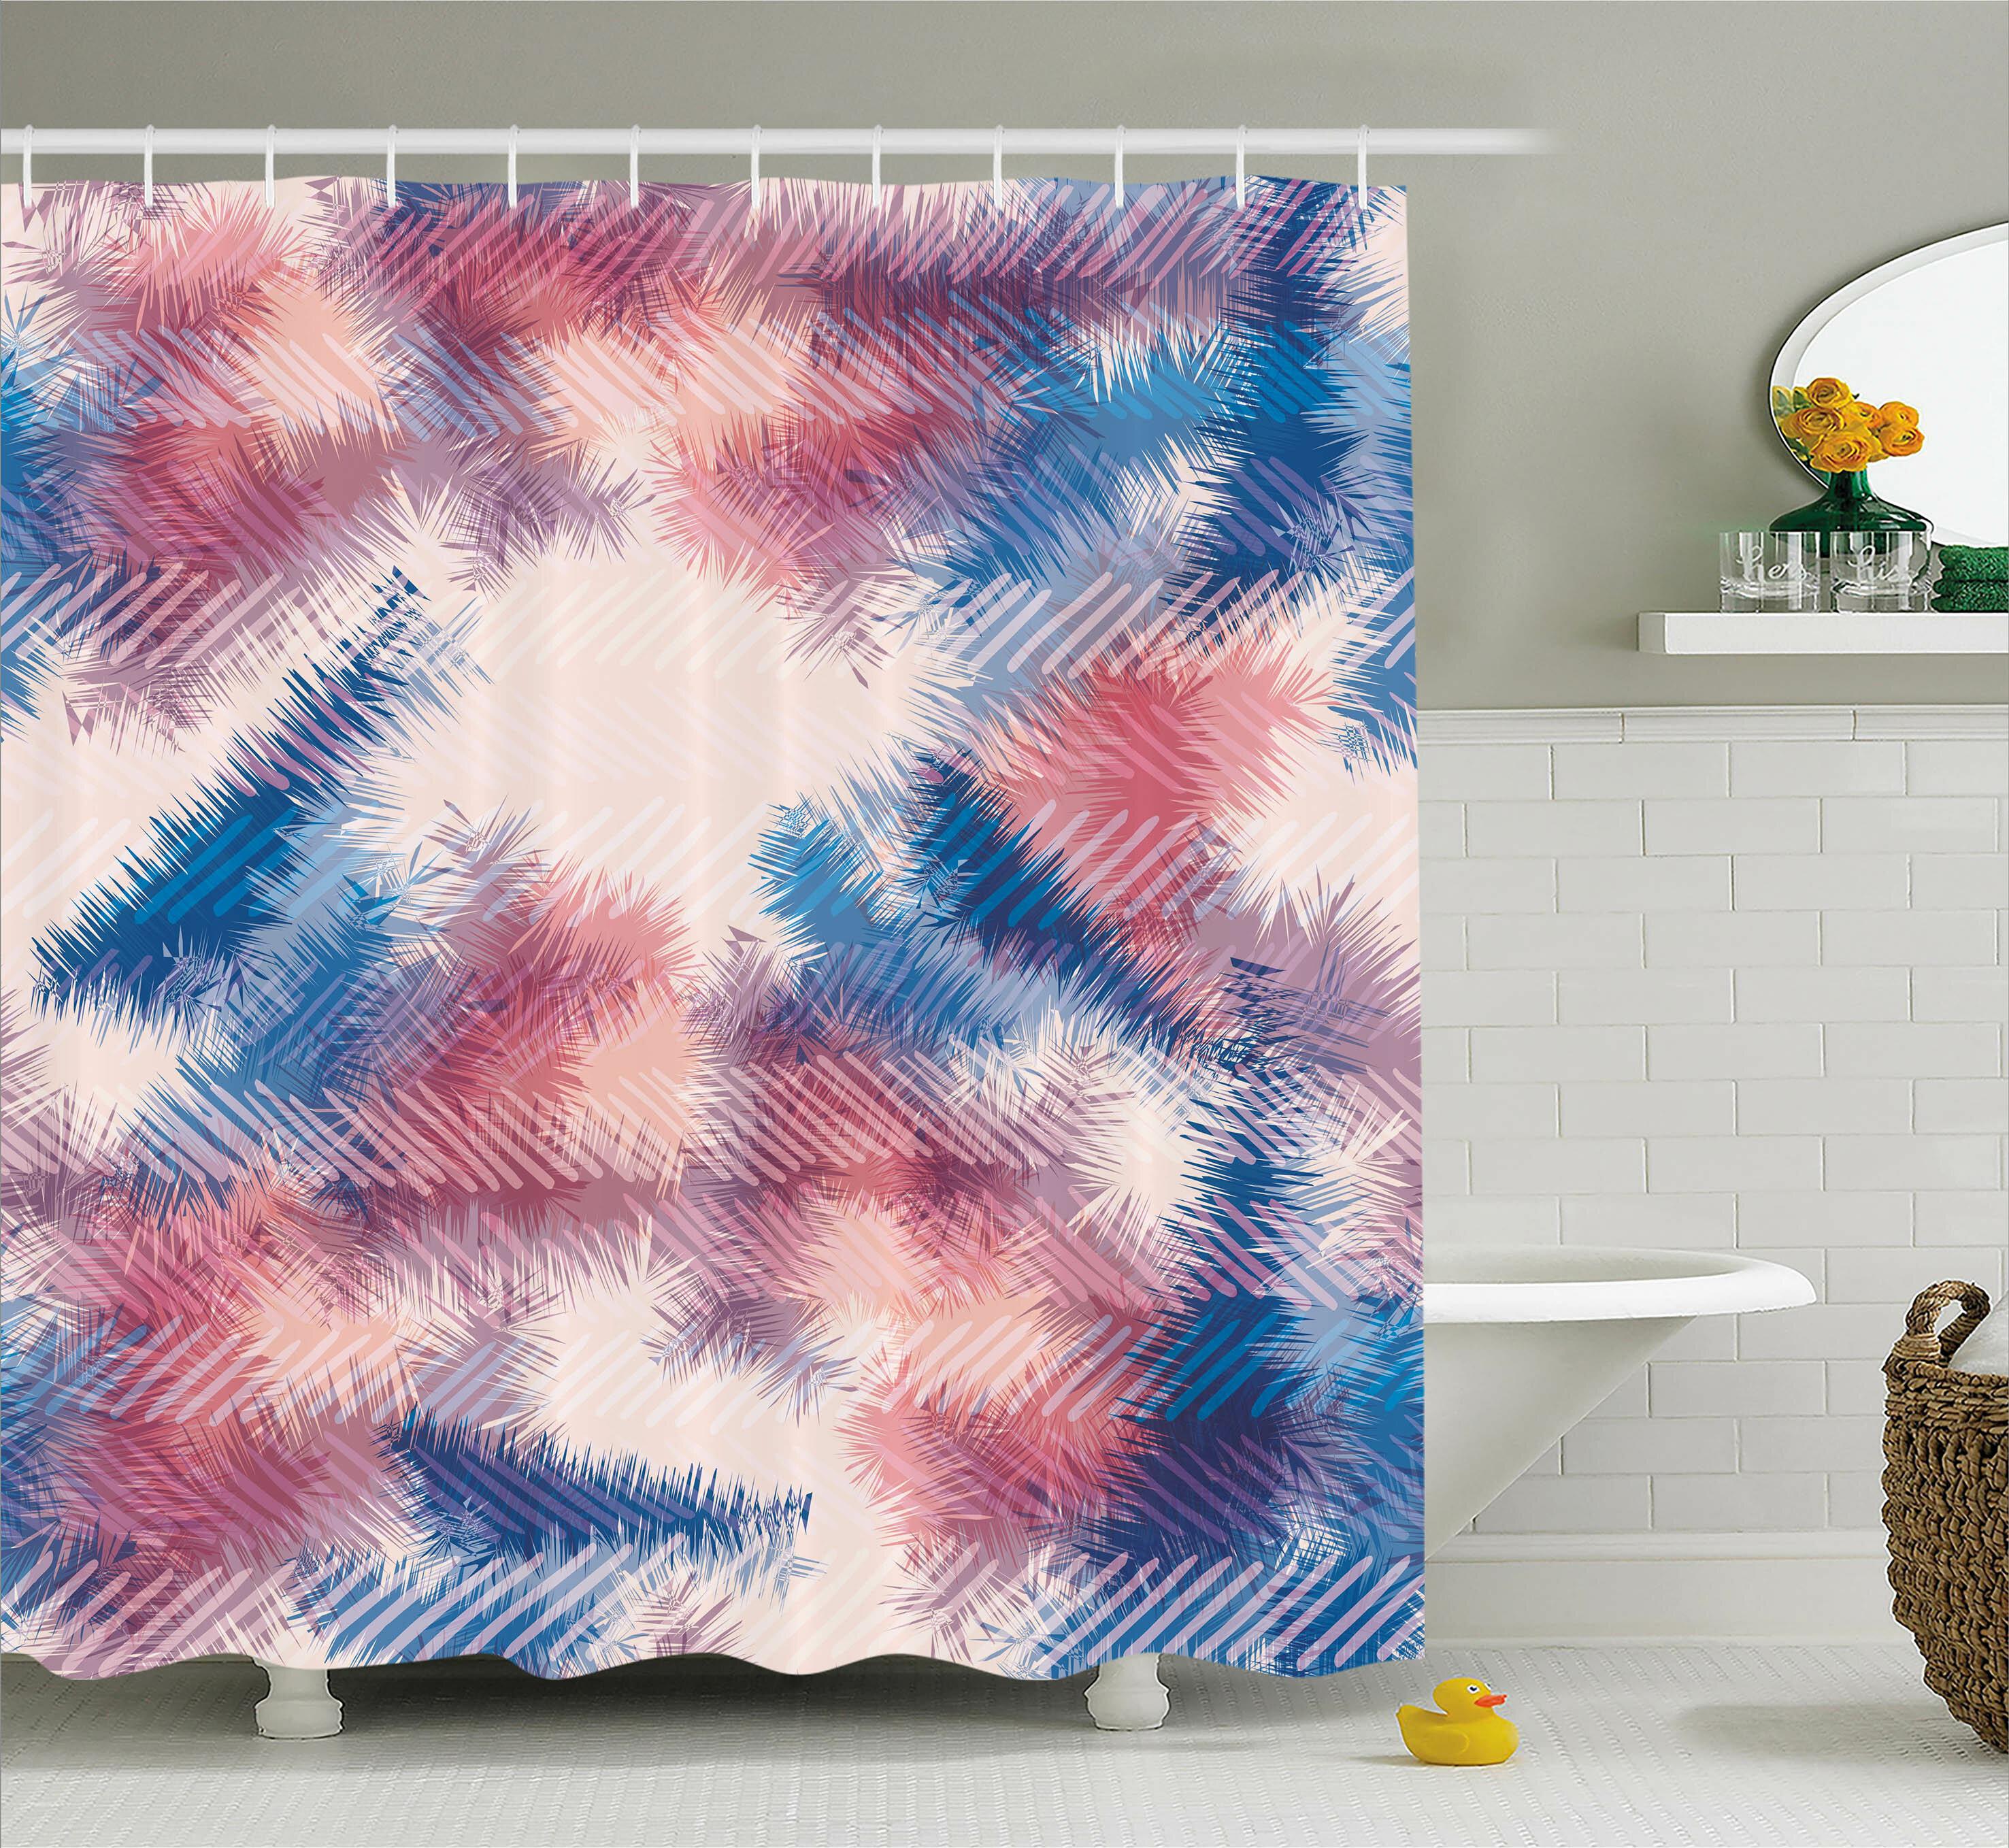 Ebern Designs Alisa Boho Digital Tie Dye Effect Graphic With Soft Feather Patterns Tribal Art Print Shower Curtain